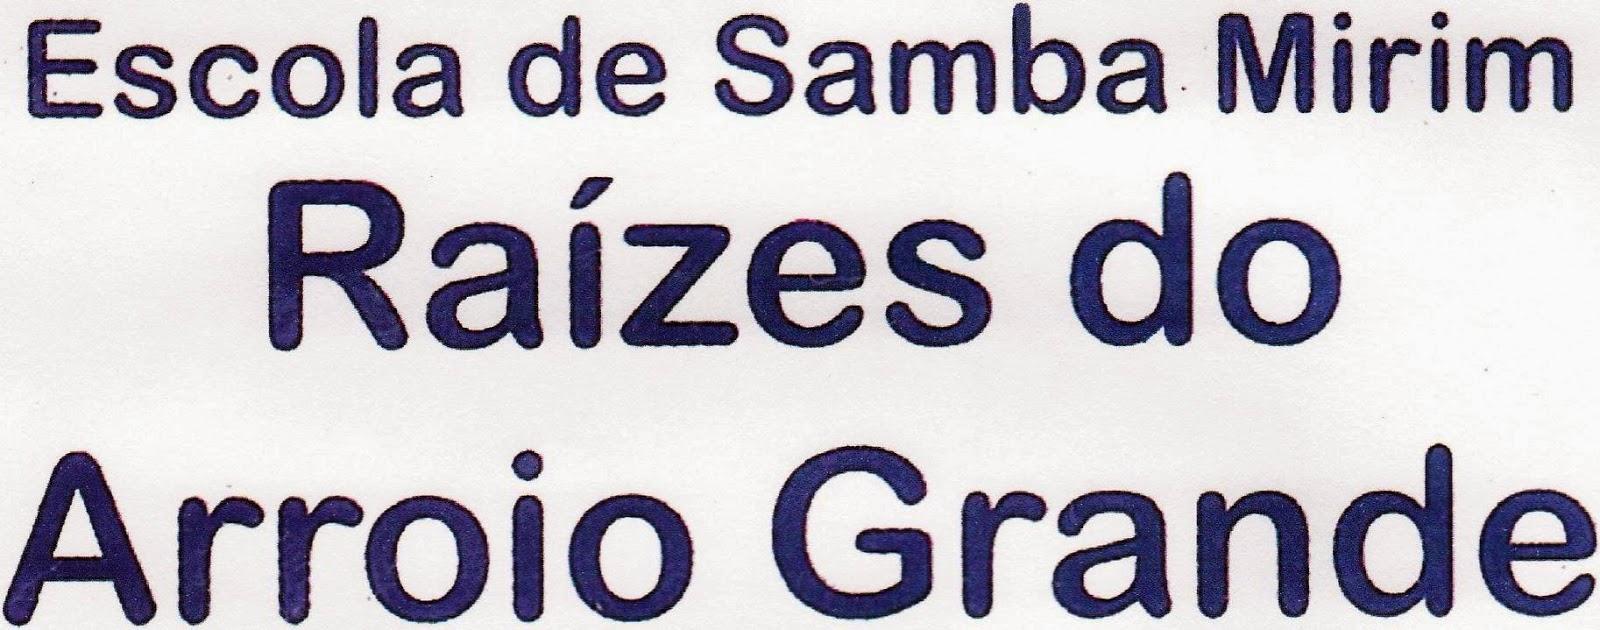 http://2.bp.blogspot.com/-fyaeOWMZuLM/Uzgc4IOhIDI/AAAAAAAACPM/-AgaM7OGEsg/s1600/ESCOLA+DE+SAMBA+MIRIM+RA%C3%8DZES+DO+ARROIO+GRANDE.JPG